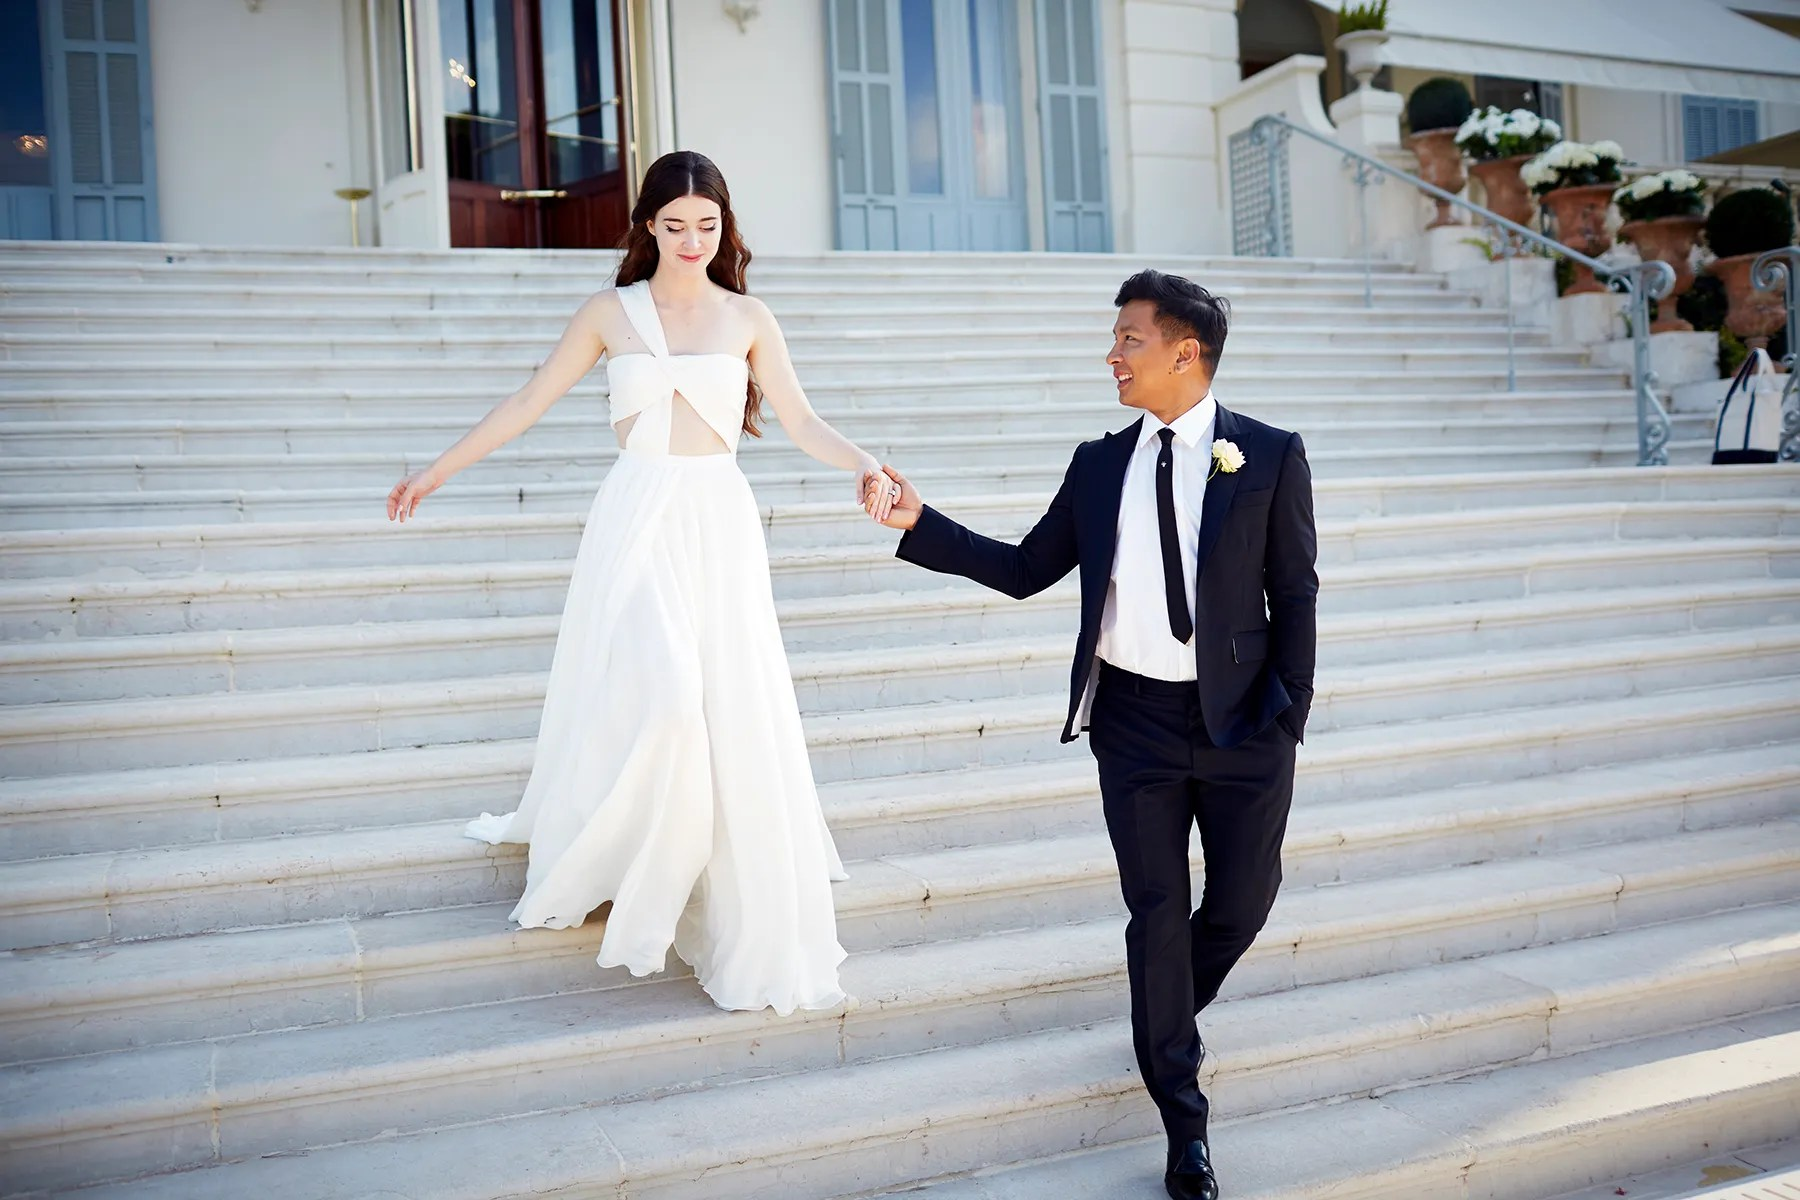 nell diamond teddy wasserman wedding france diamond wedding dresses